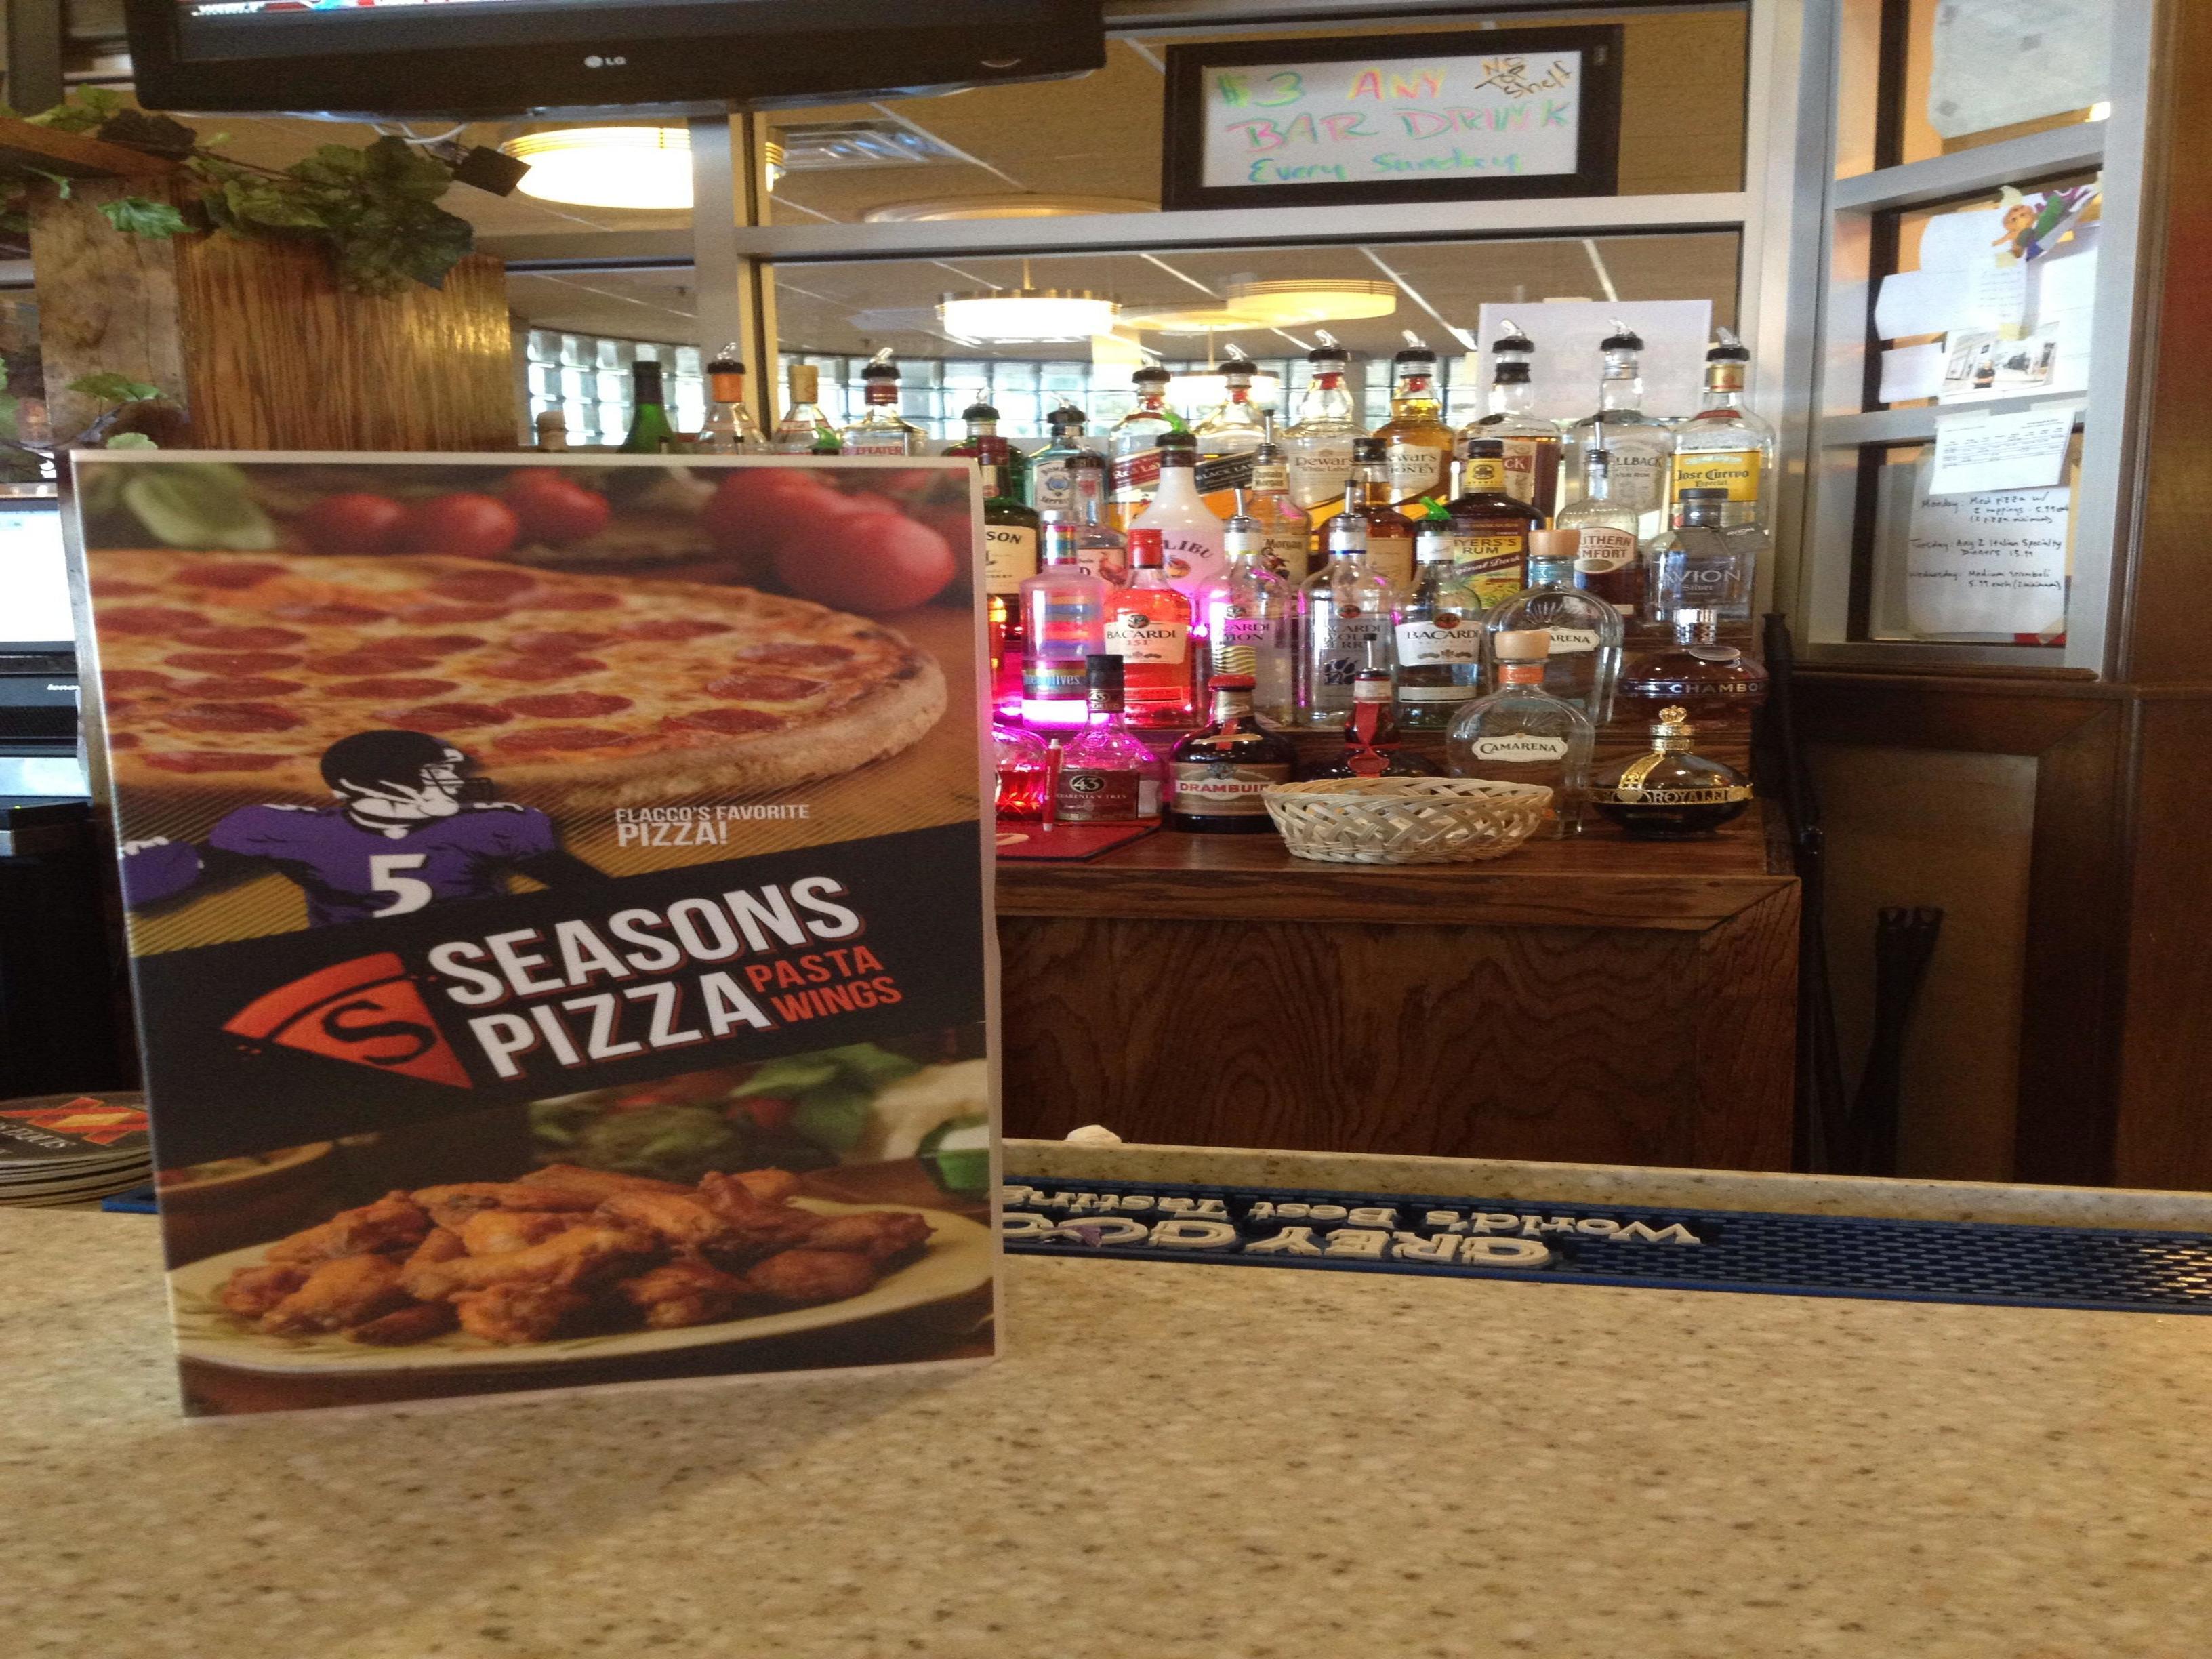 Seasons pizza coupon code